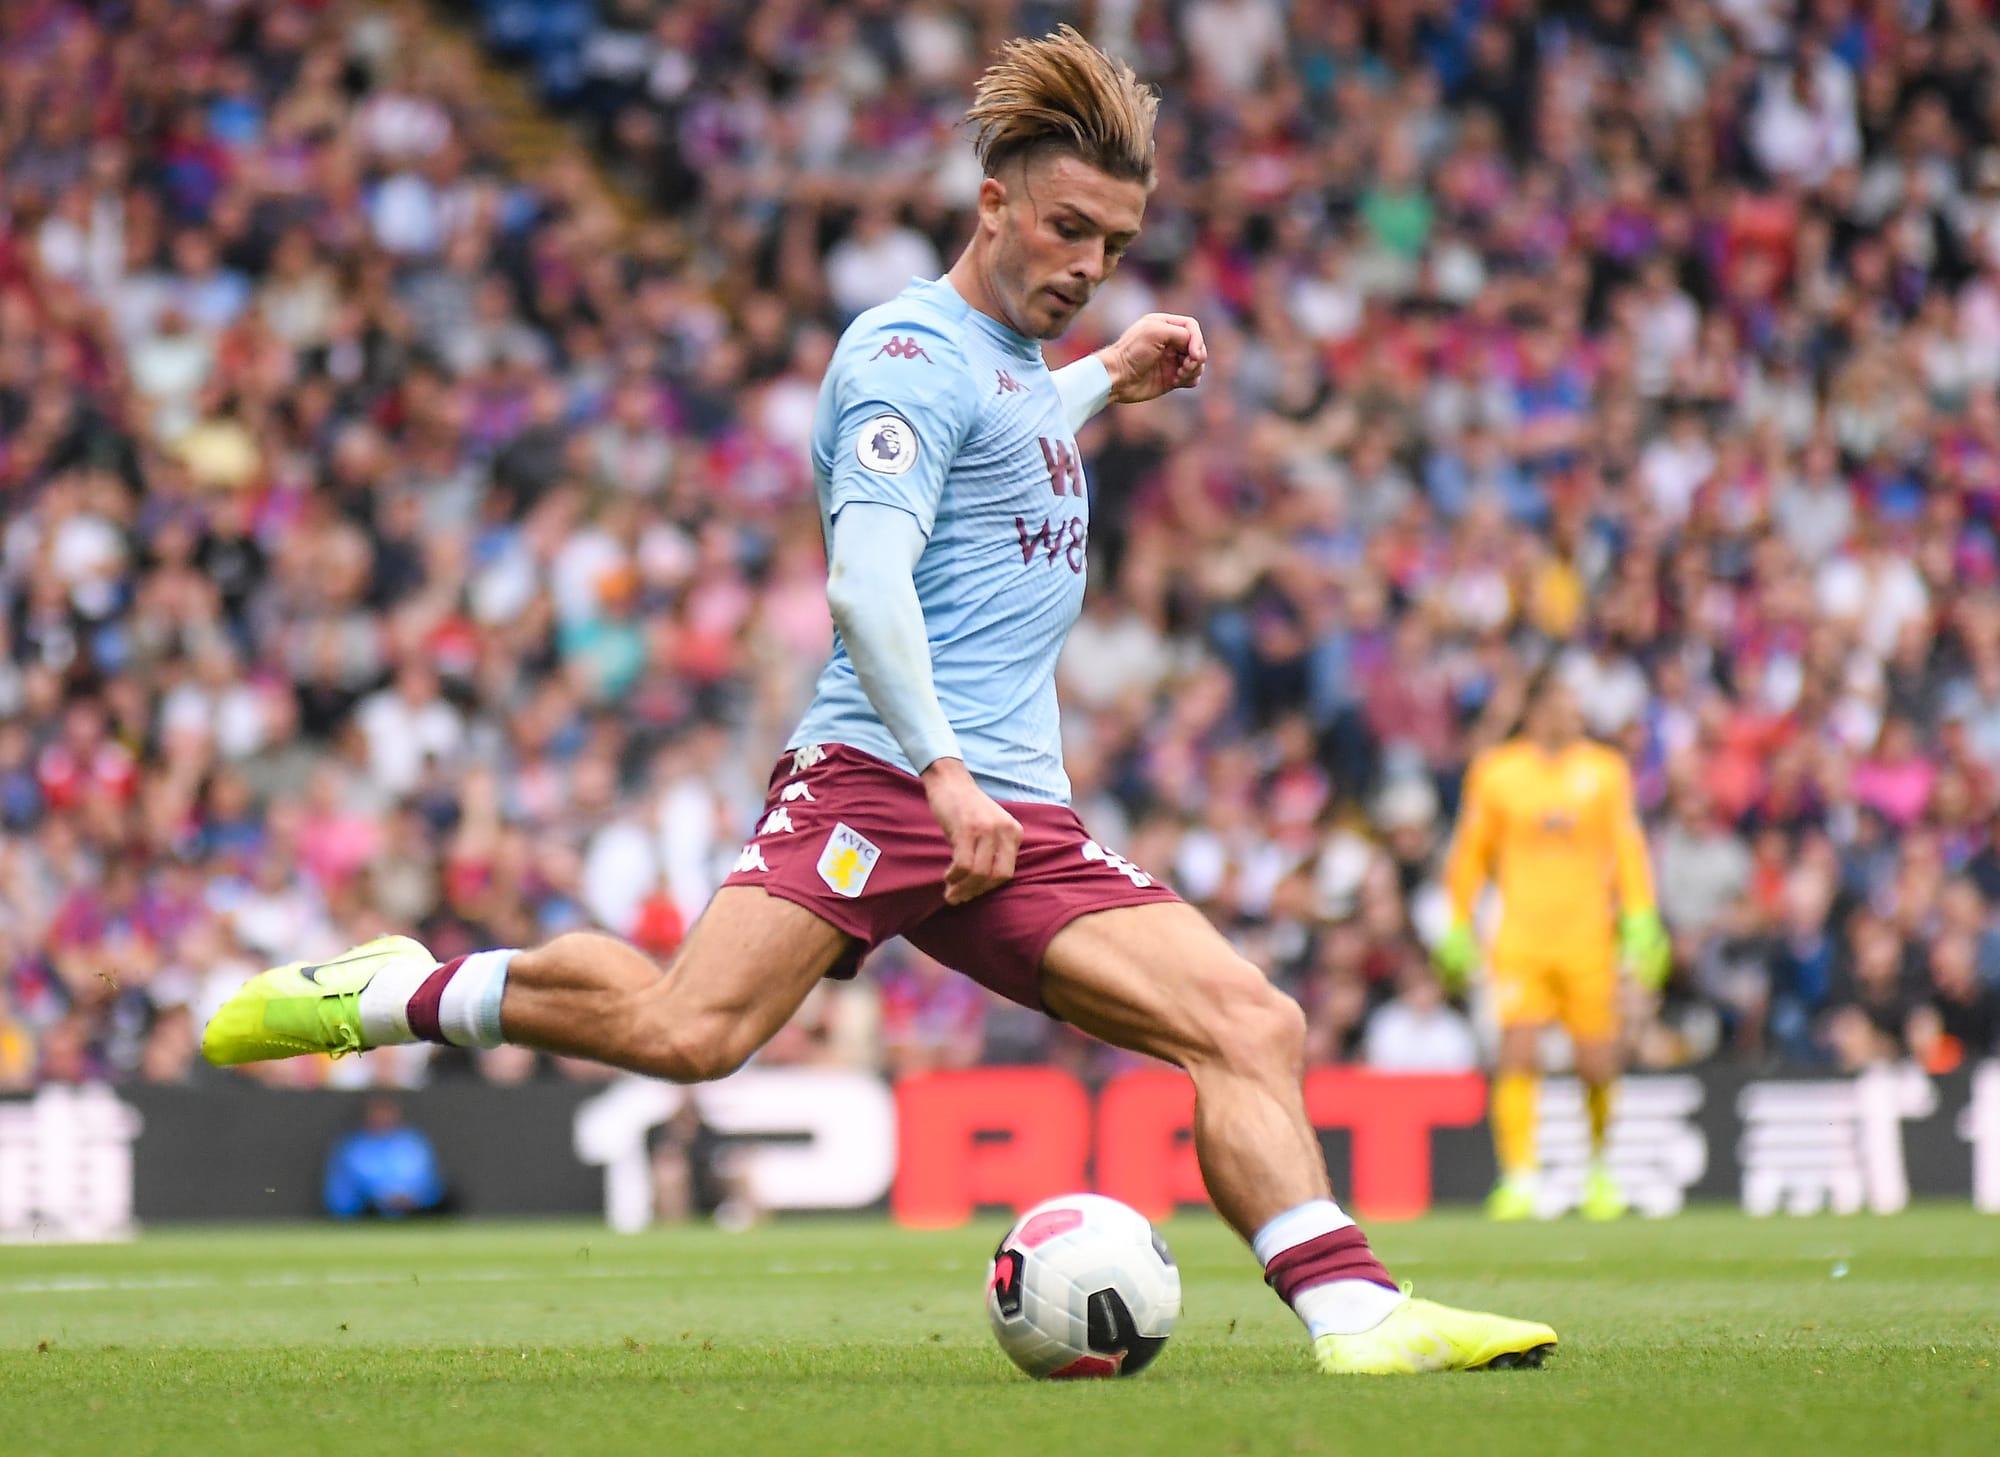 Jack Grealish of Villa